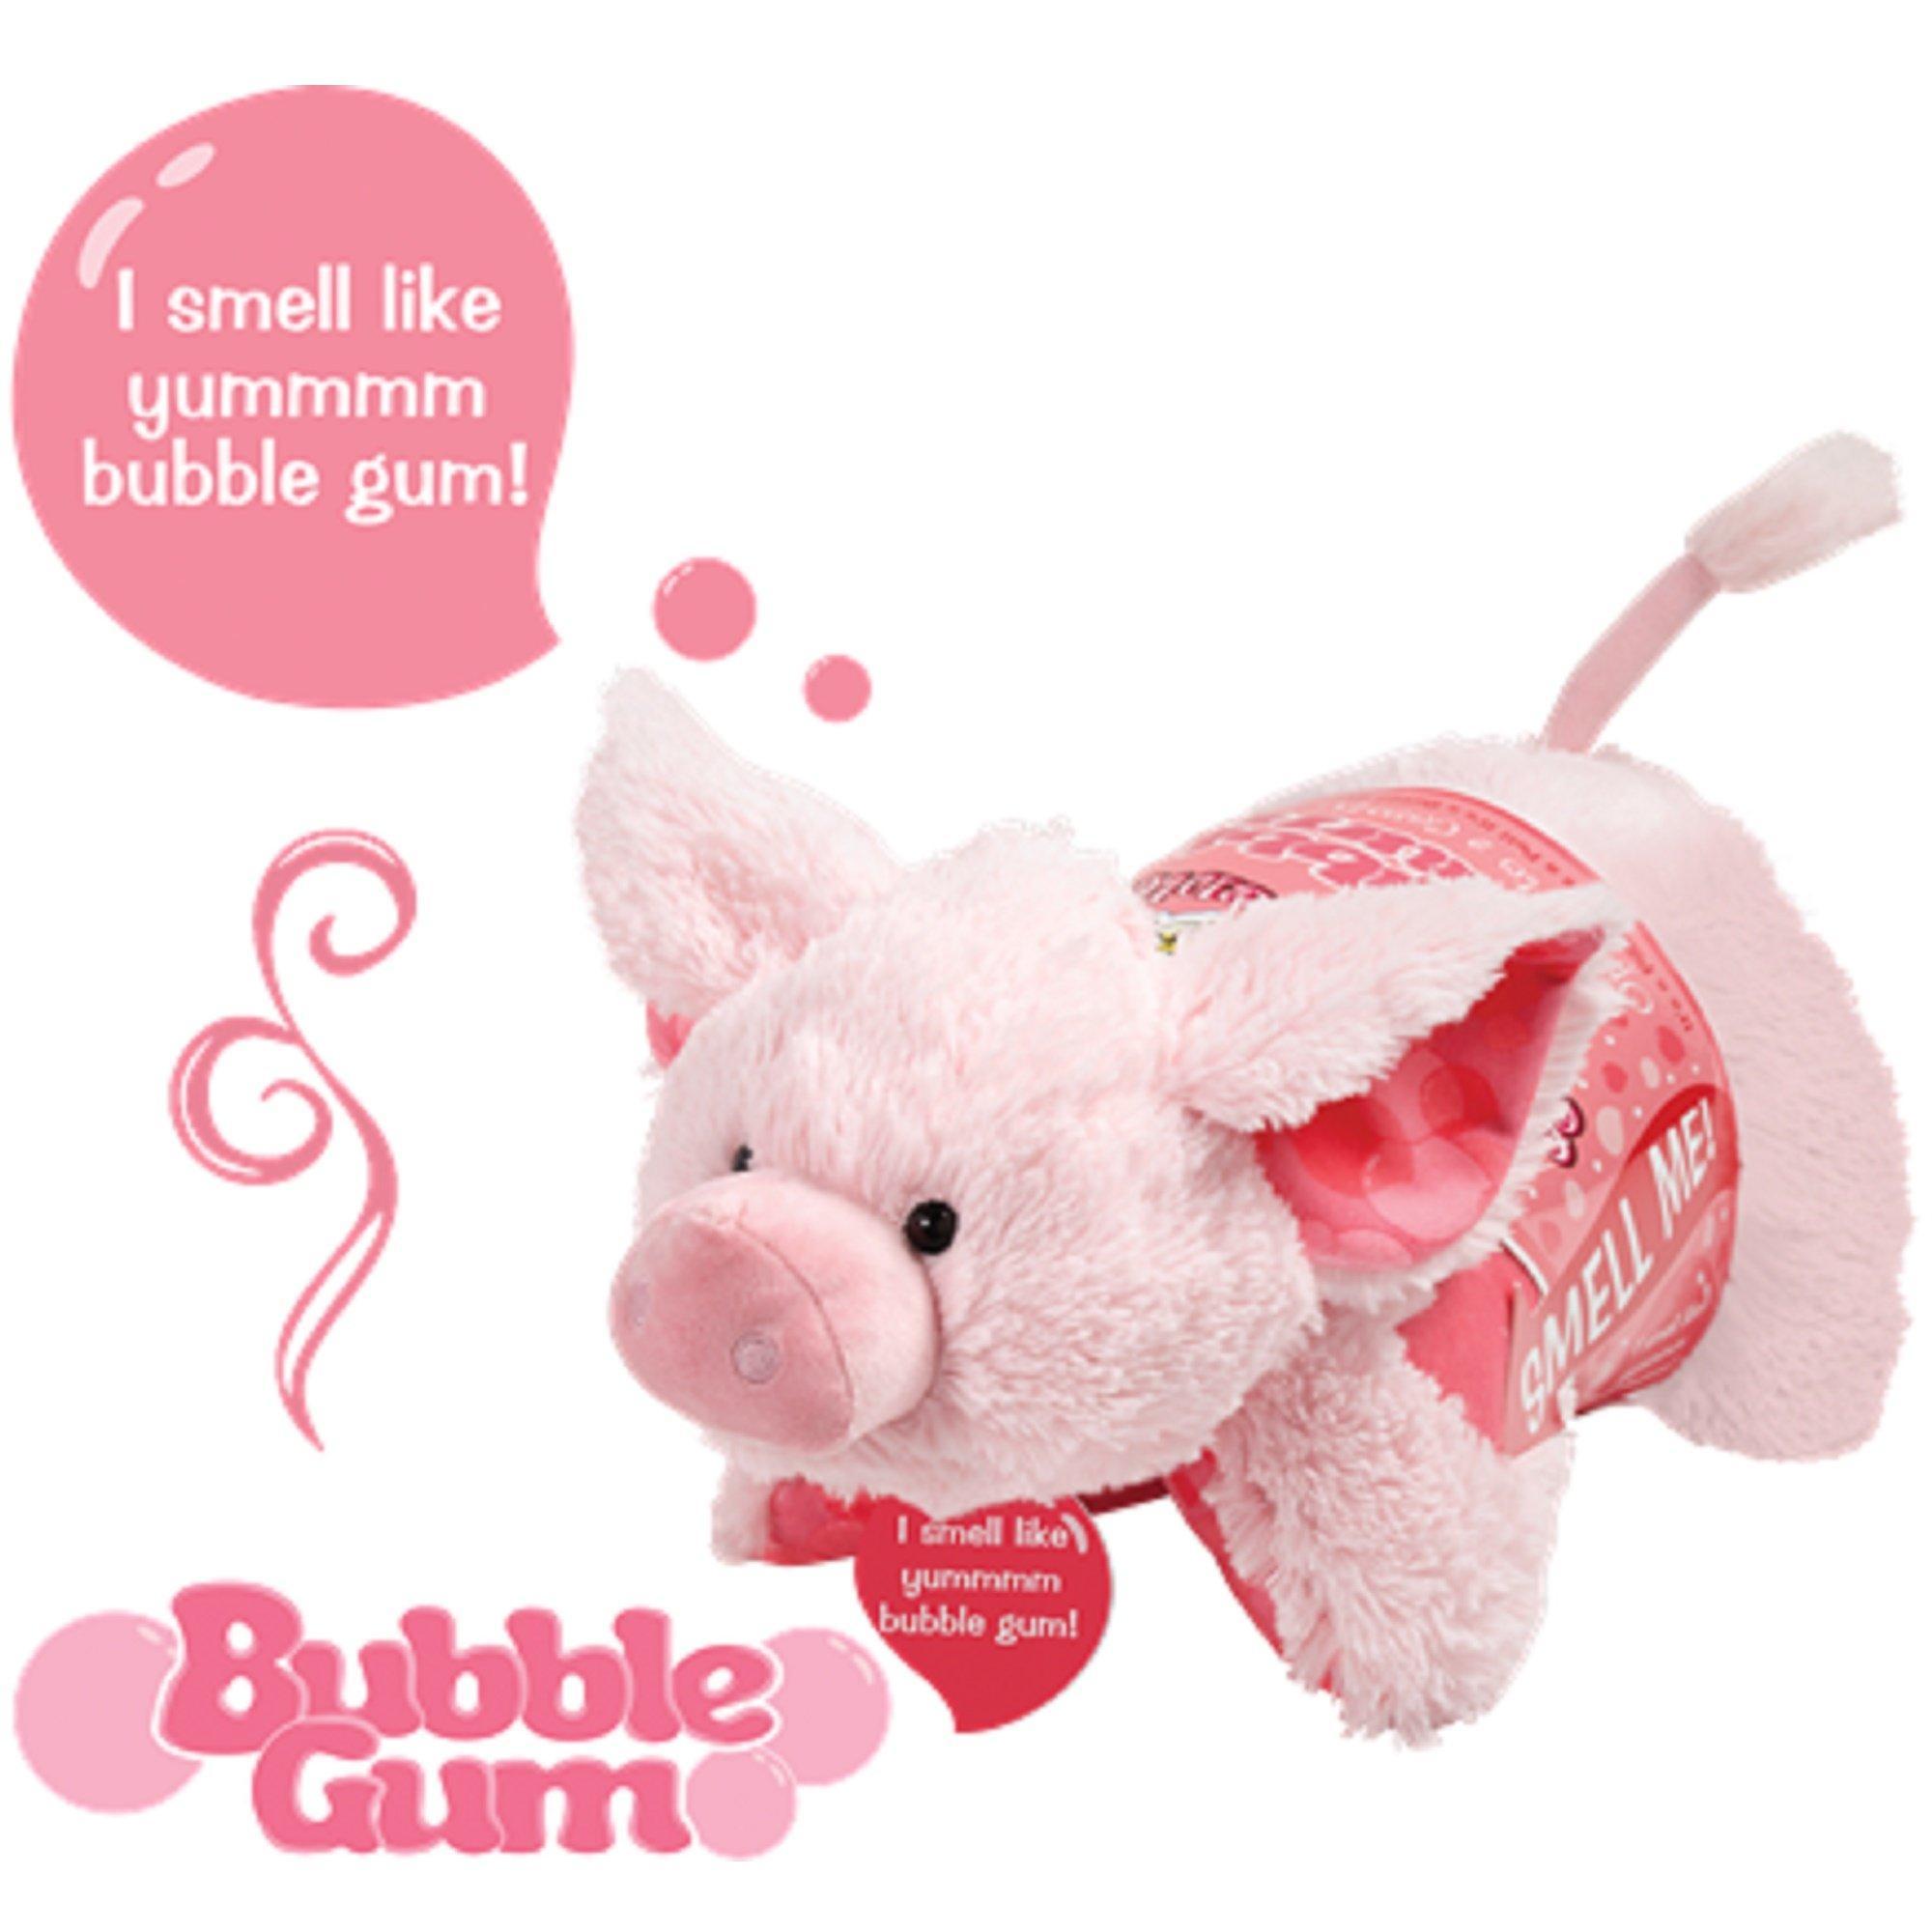 sweet scented bubble gum pig pillow pet gamestop